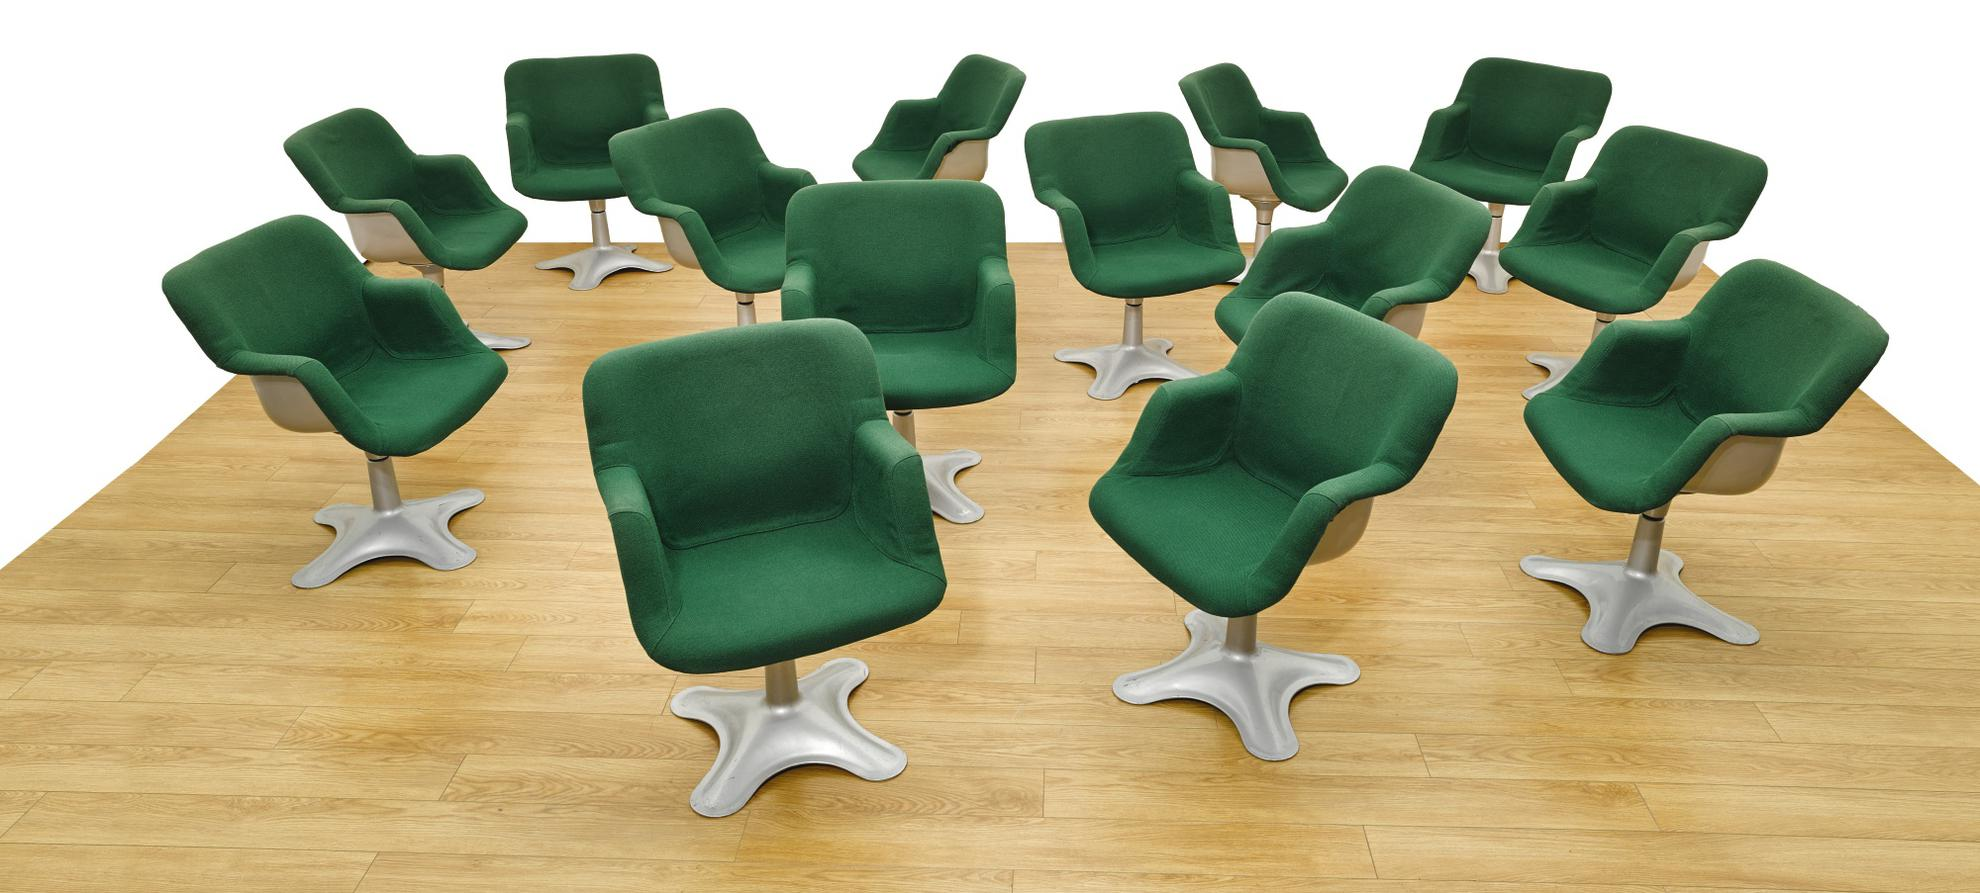 Yrjo Kukkapuro - Fourteen Chairs, Model No. 417-1960